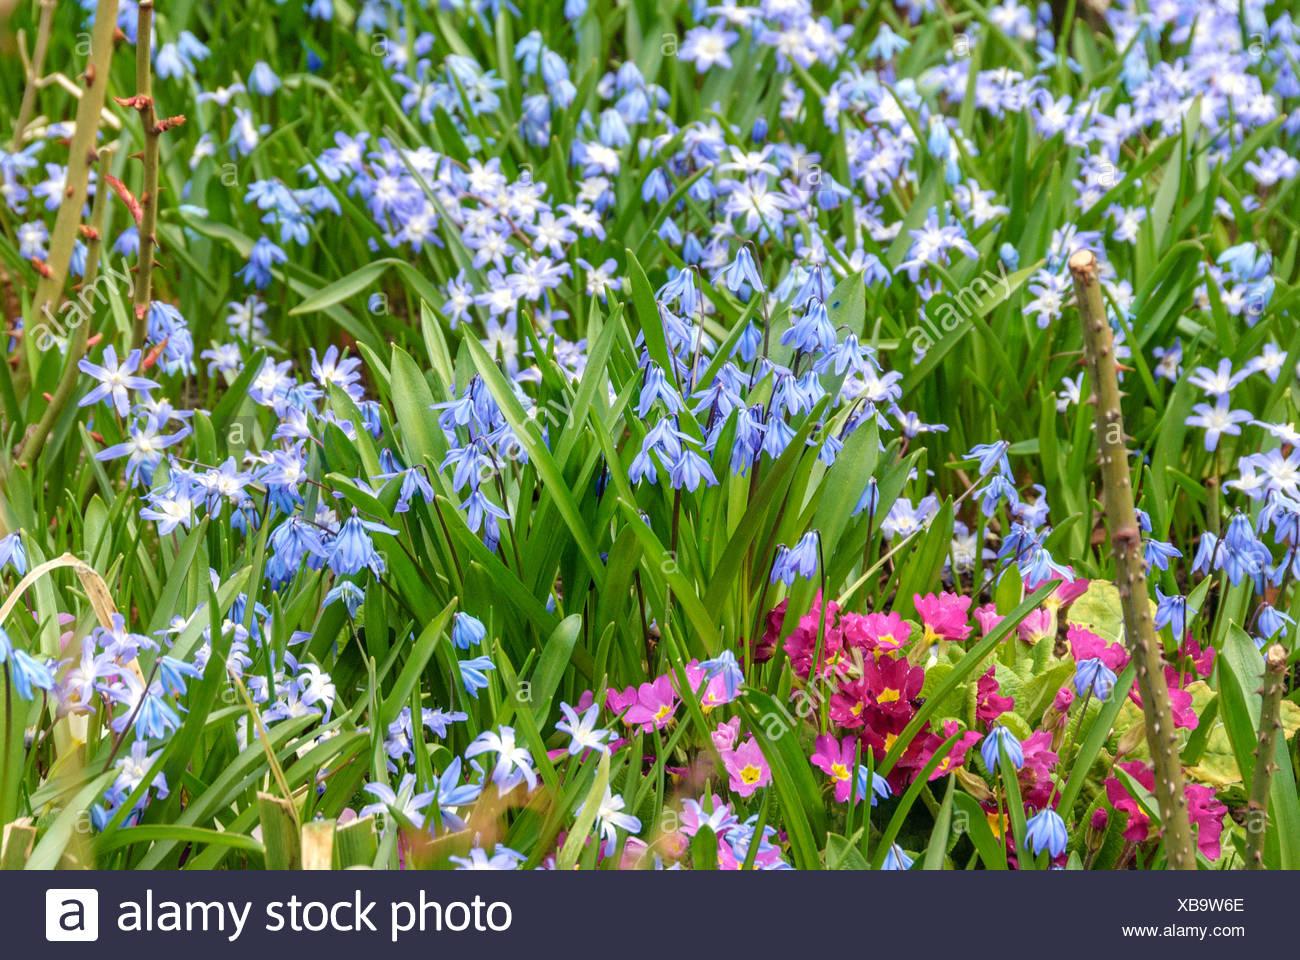 Siberian scilla, Siberian squill (Scilla siberica (falsch: Scilla sibirica)), blooming together with primroses, Germany - Stock Image